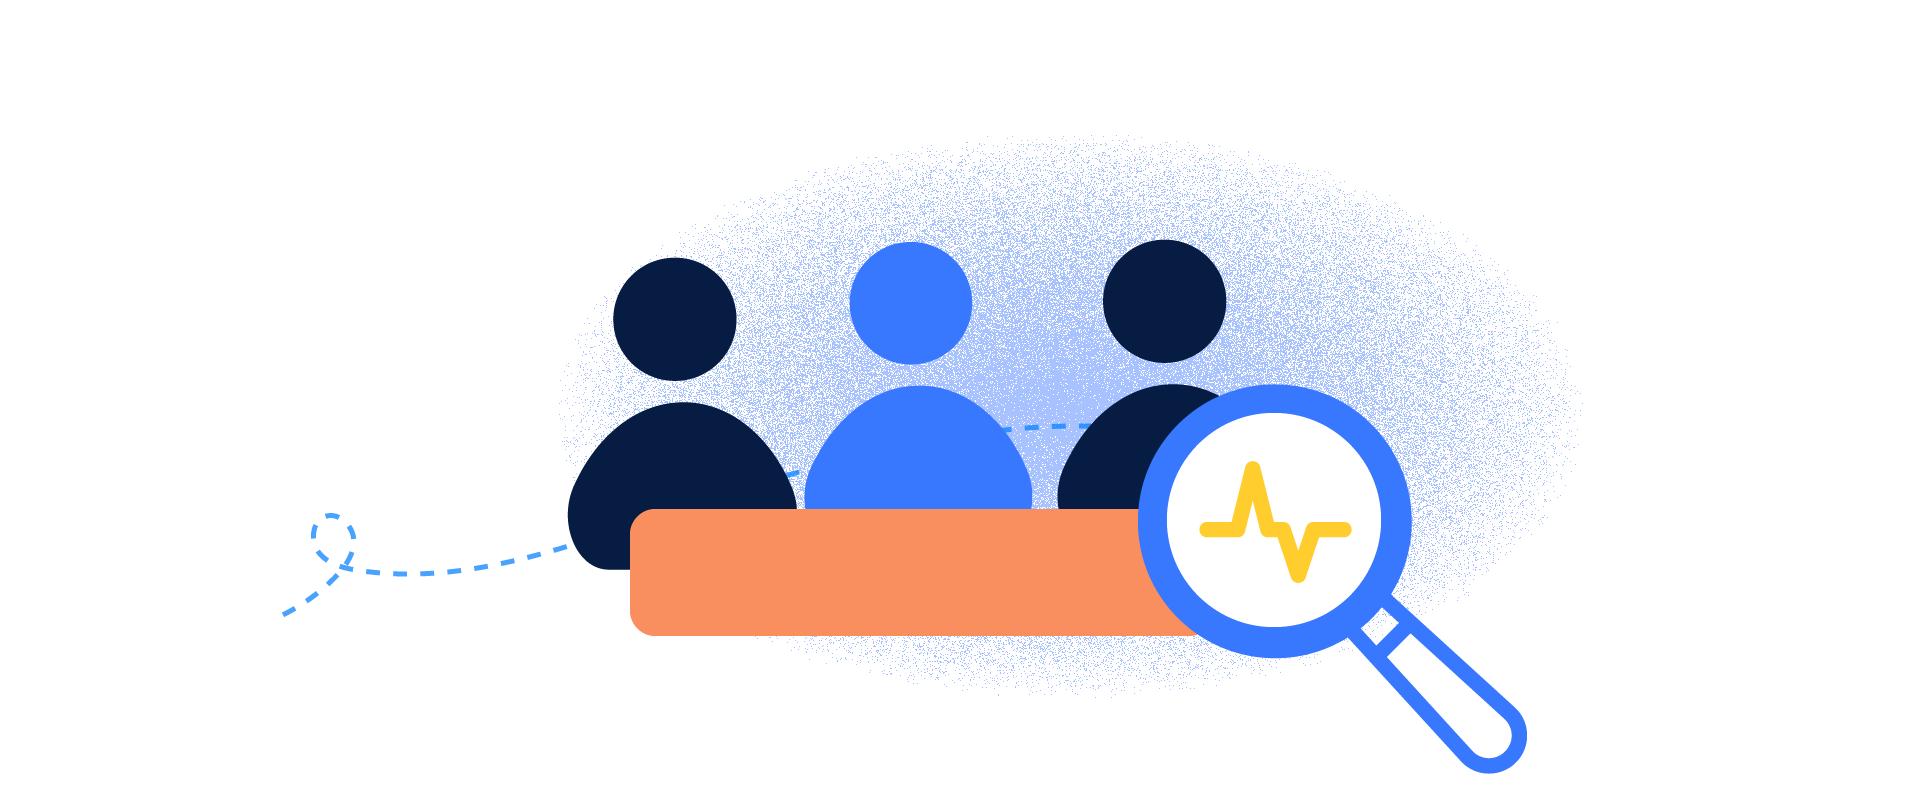 Meeting health analysis